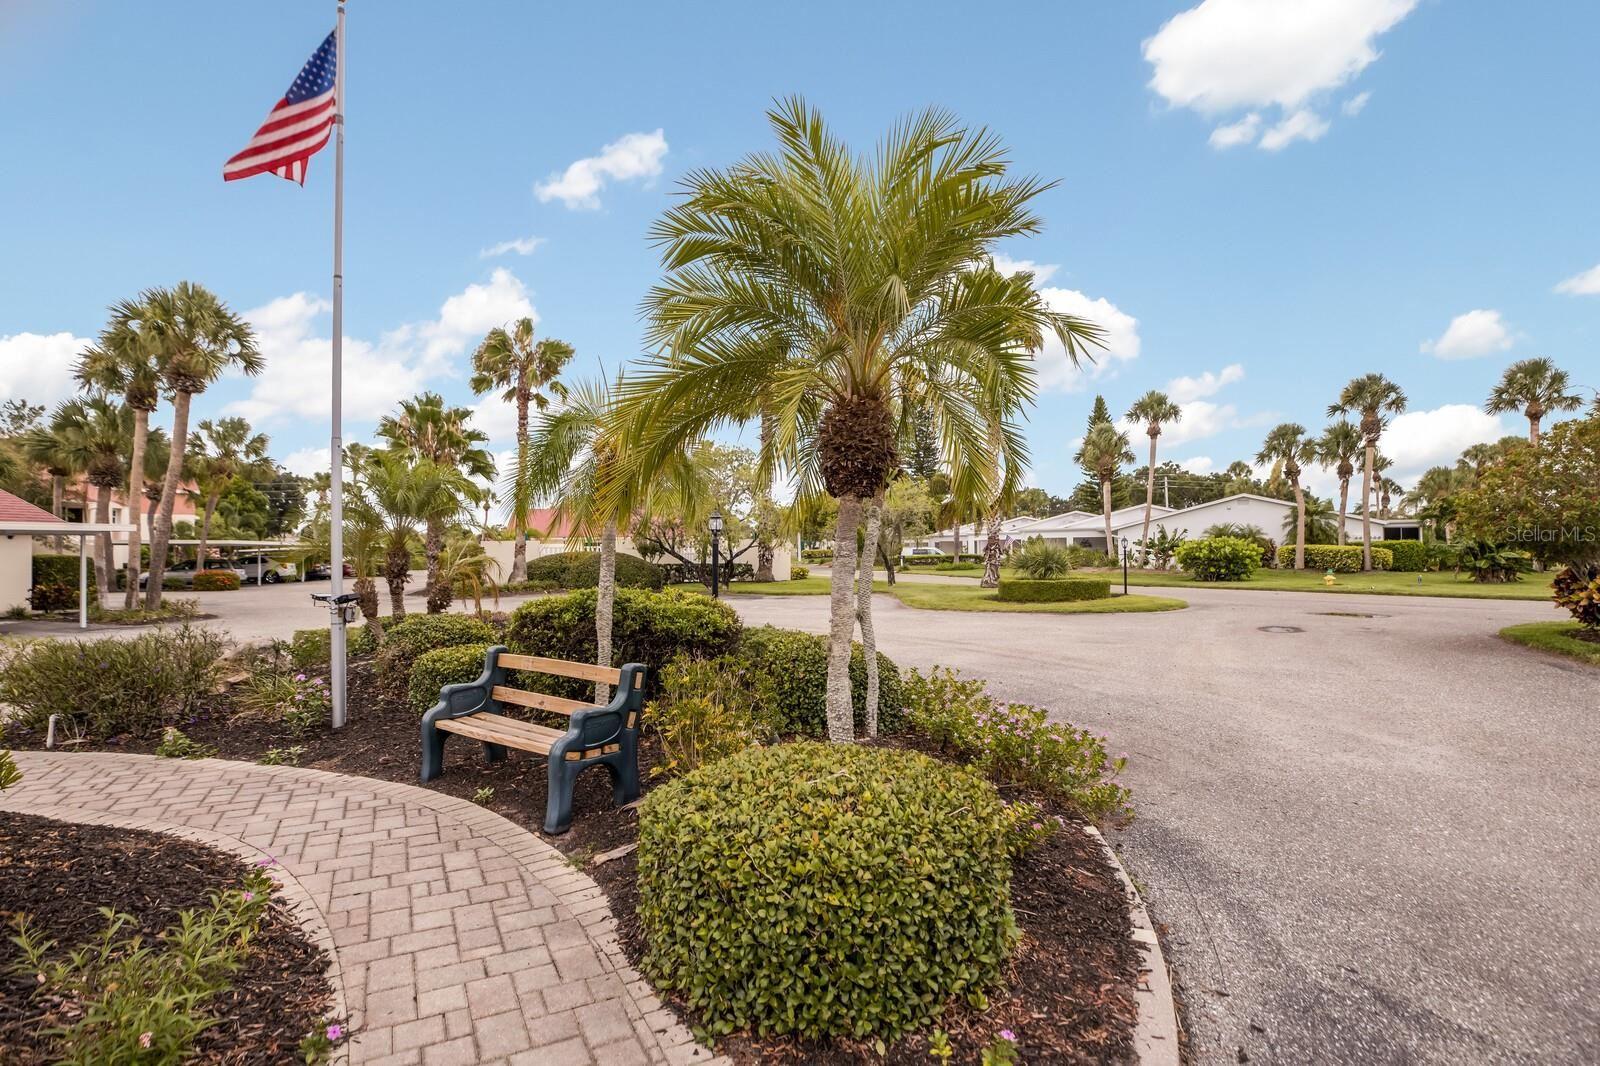 Photo of 764 VILLAGE CIRCLE #222, VENICE, FL 34292 (MLS # A4504097)